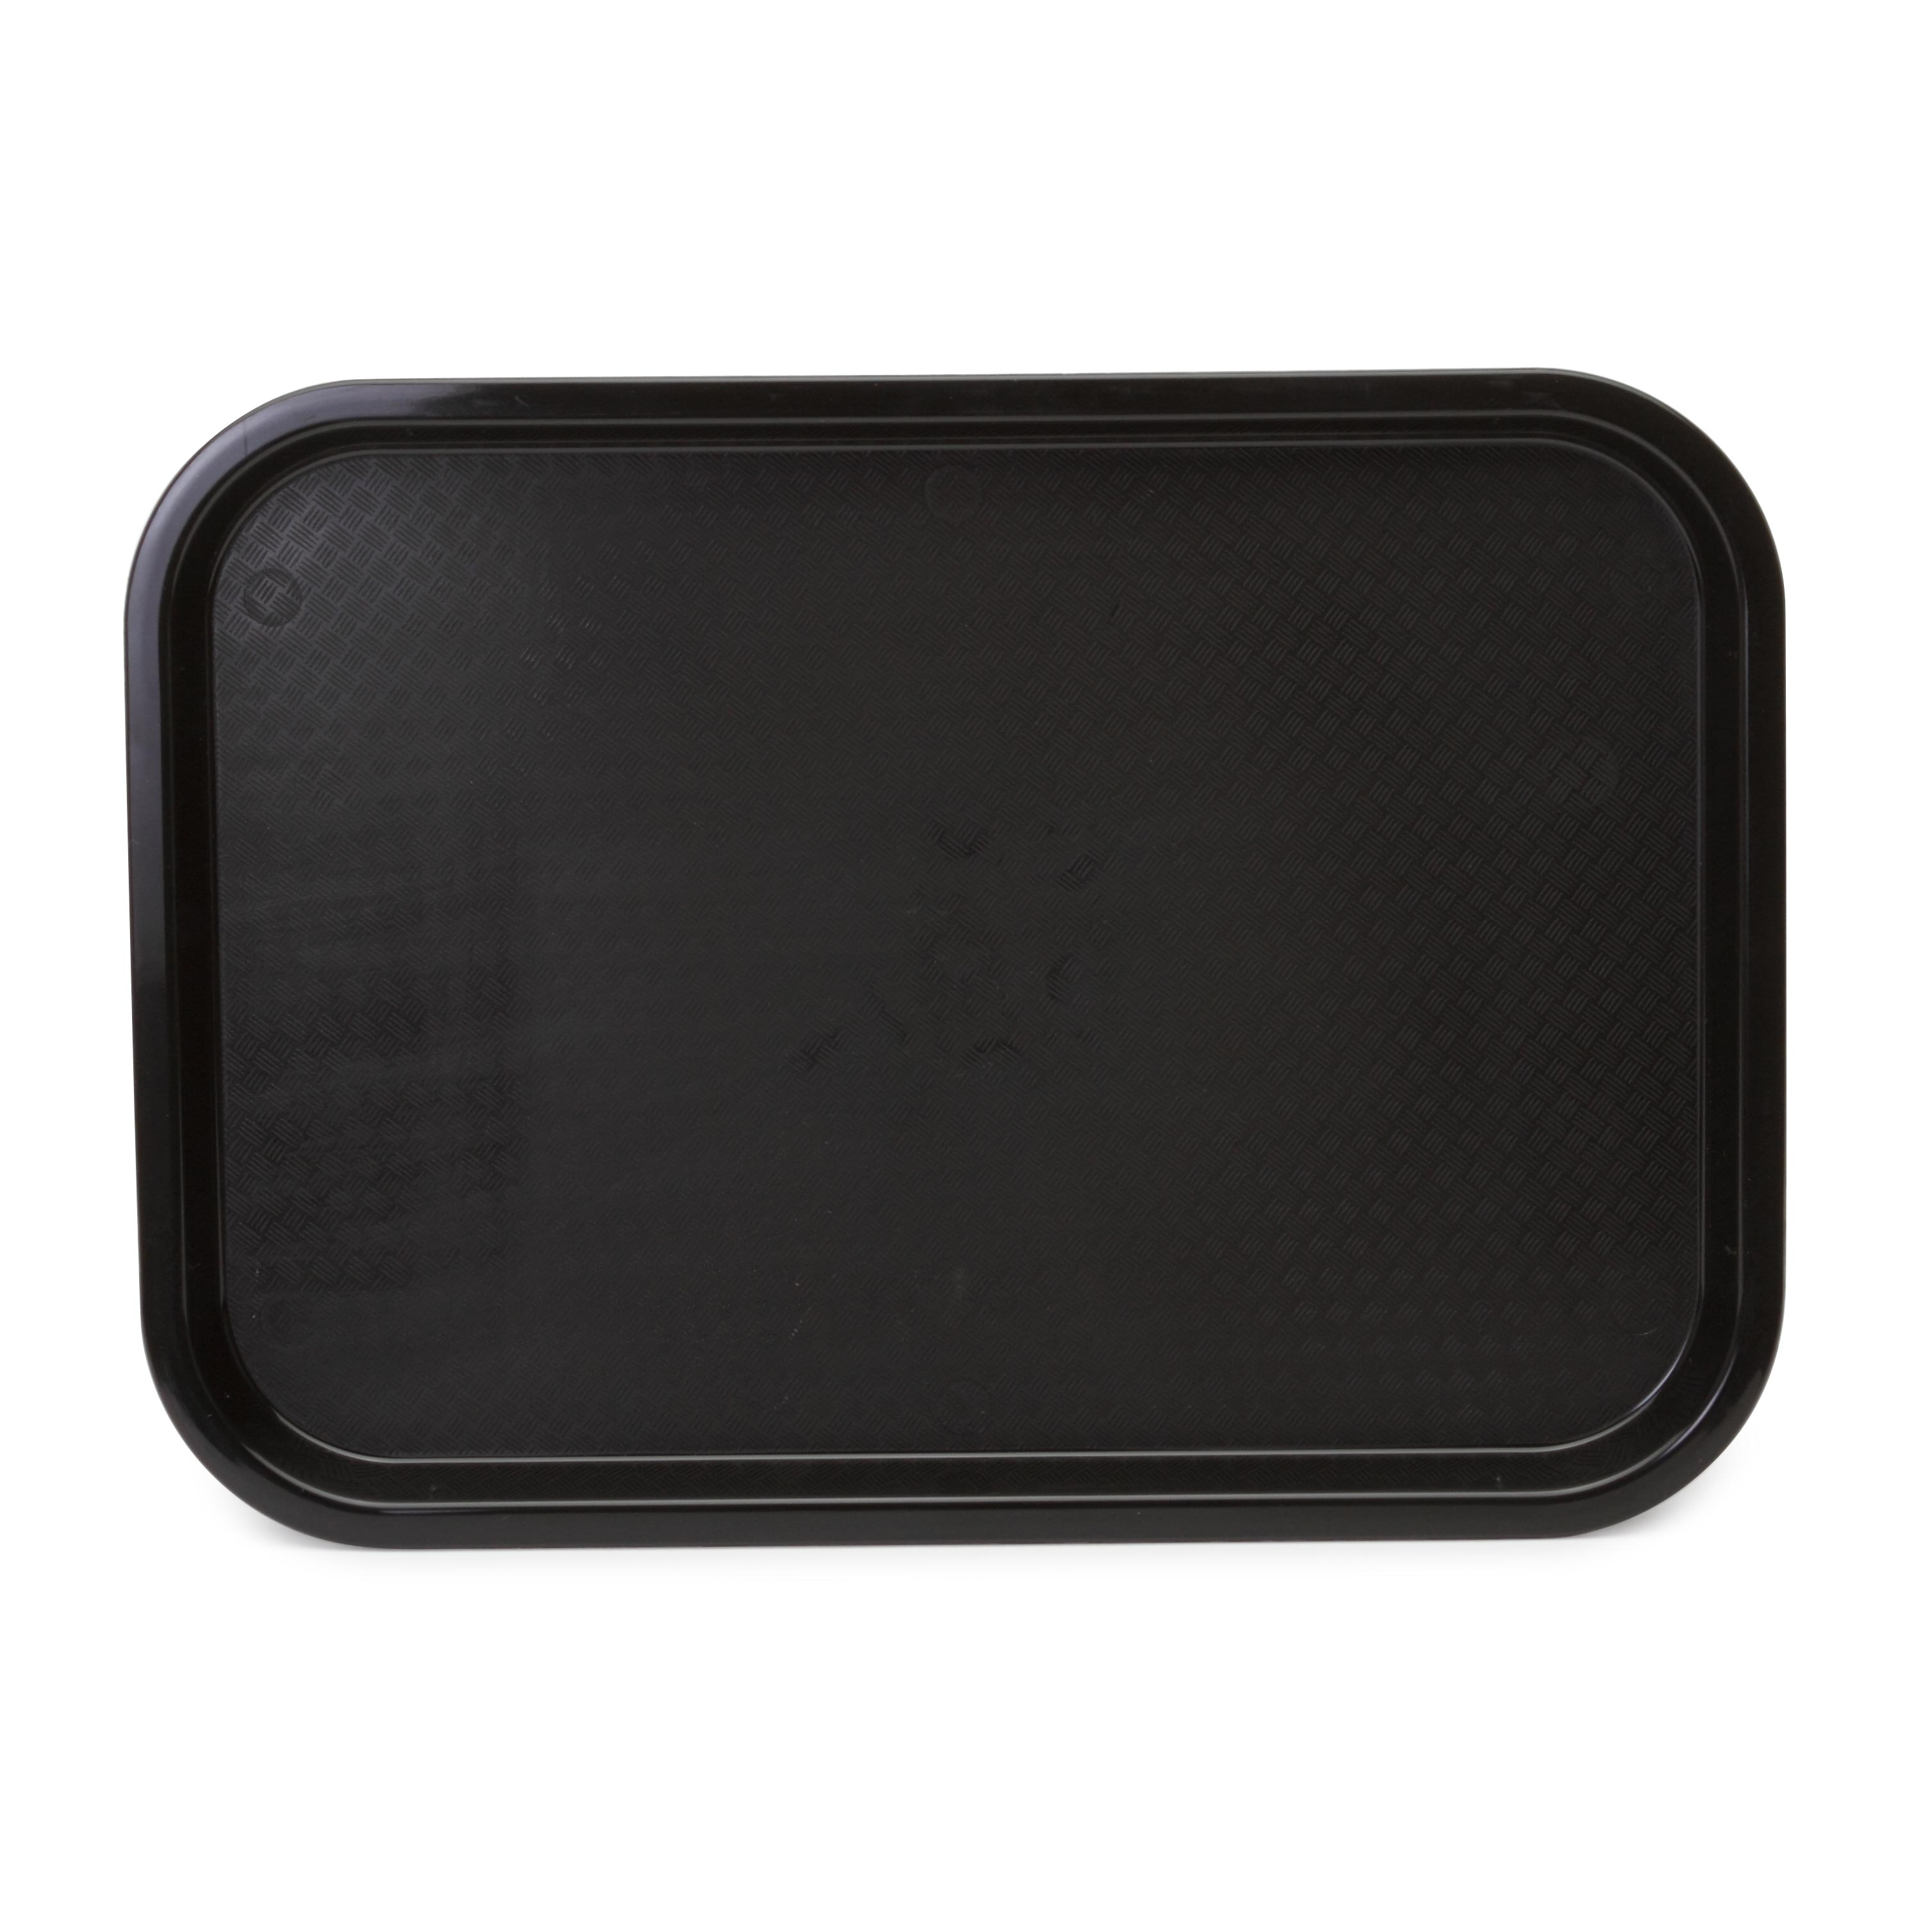 Royal Industries DIN TC141810 tray, fast food